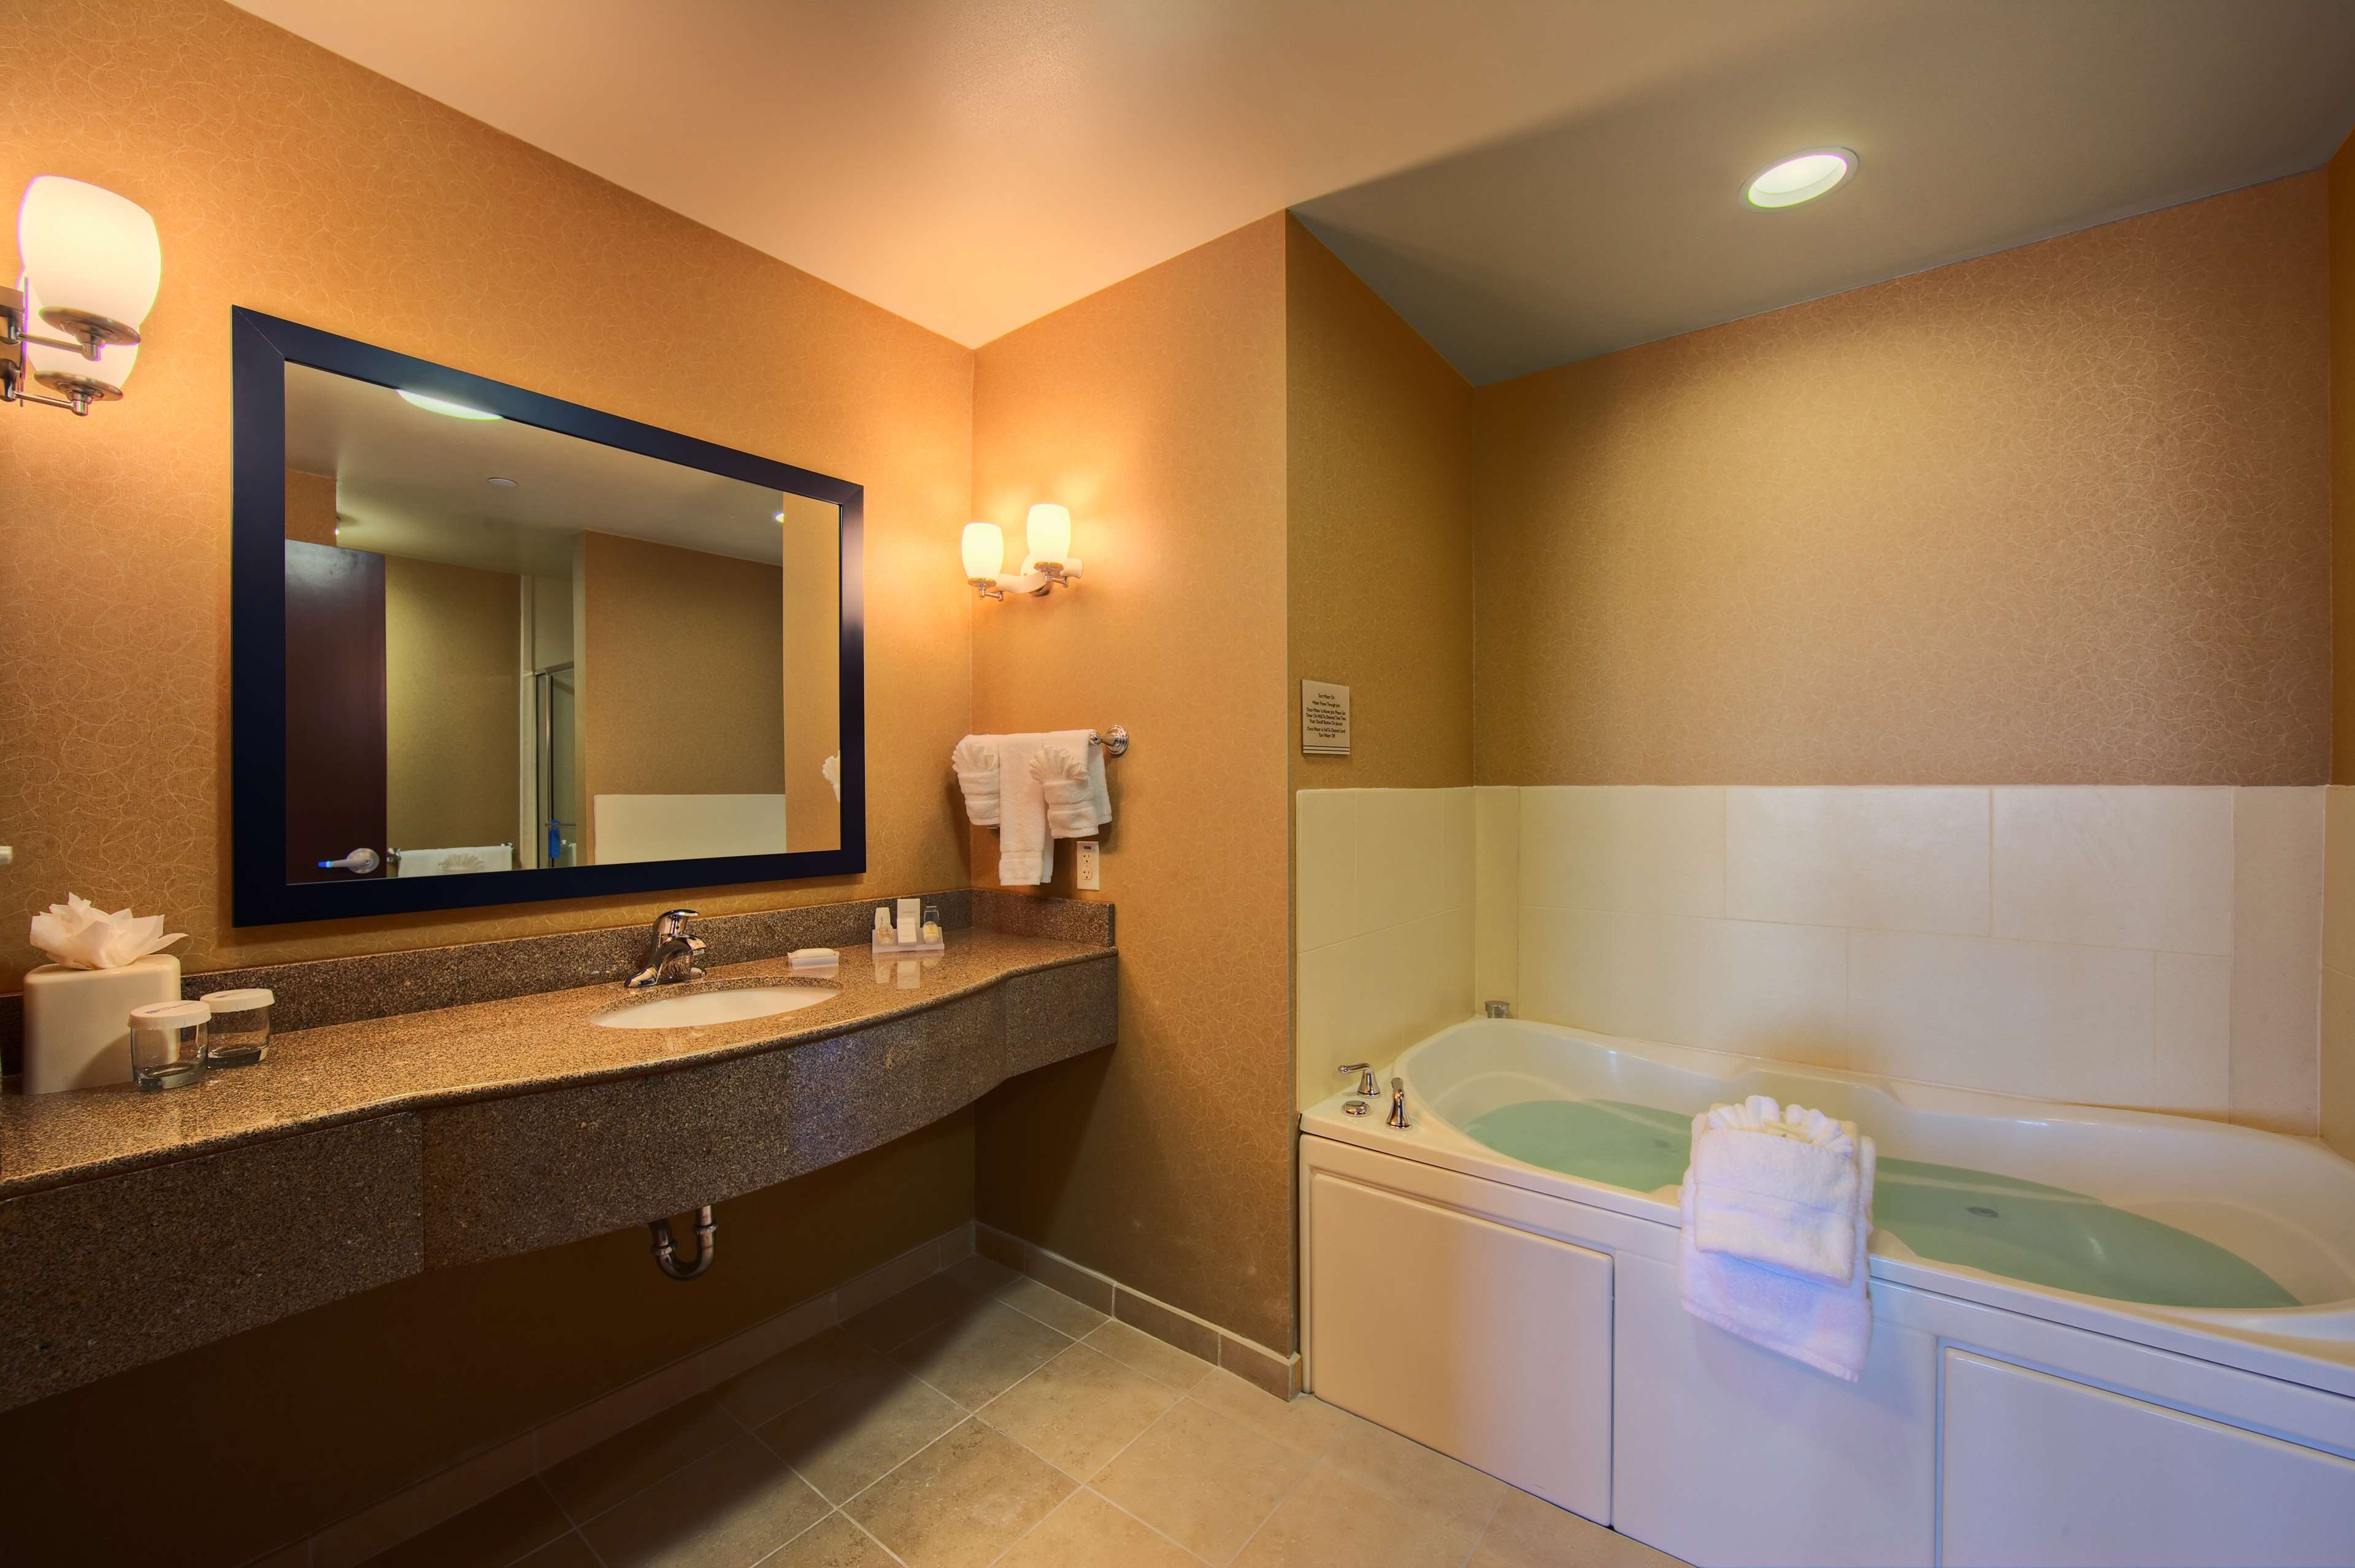 Hilton Garden Inn DFW North Grapevine image 22